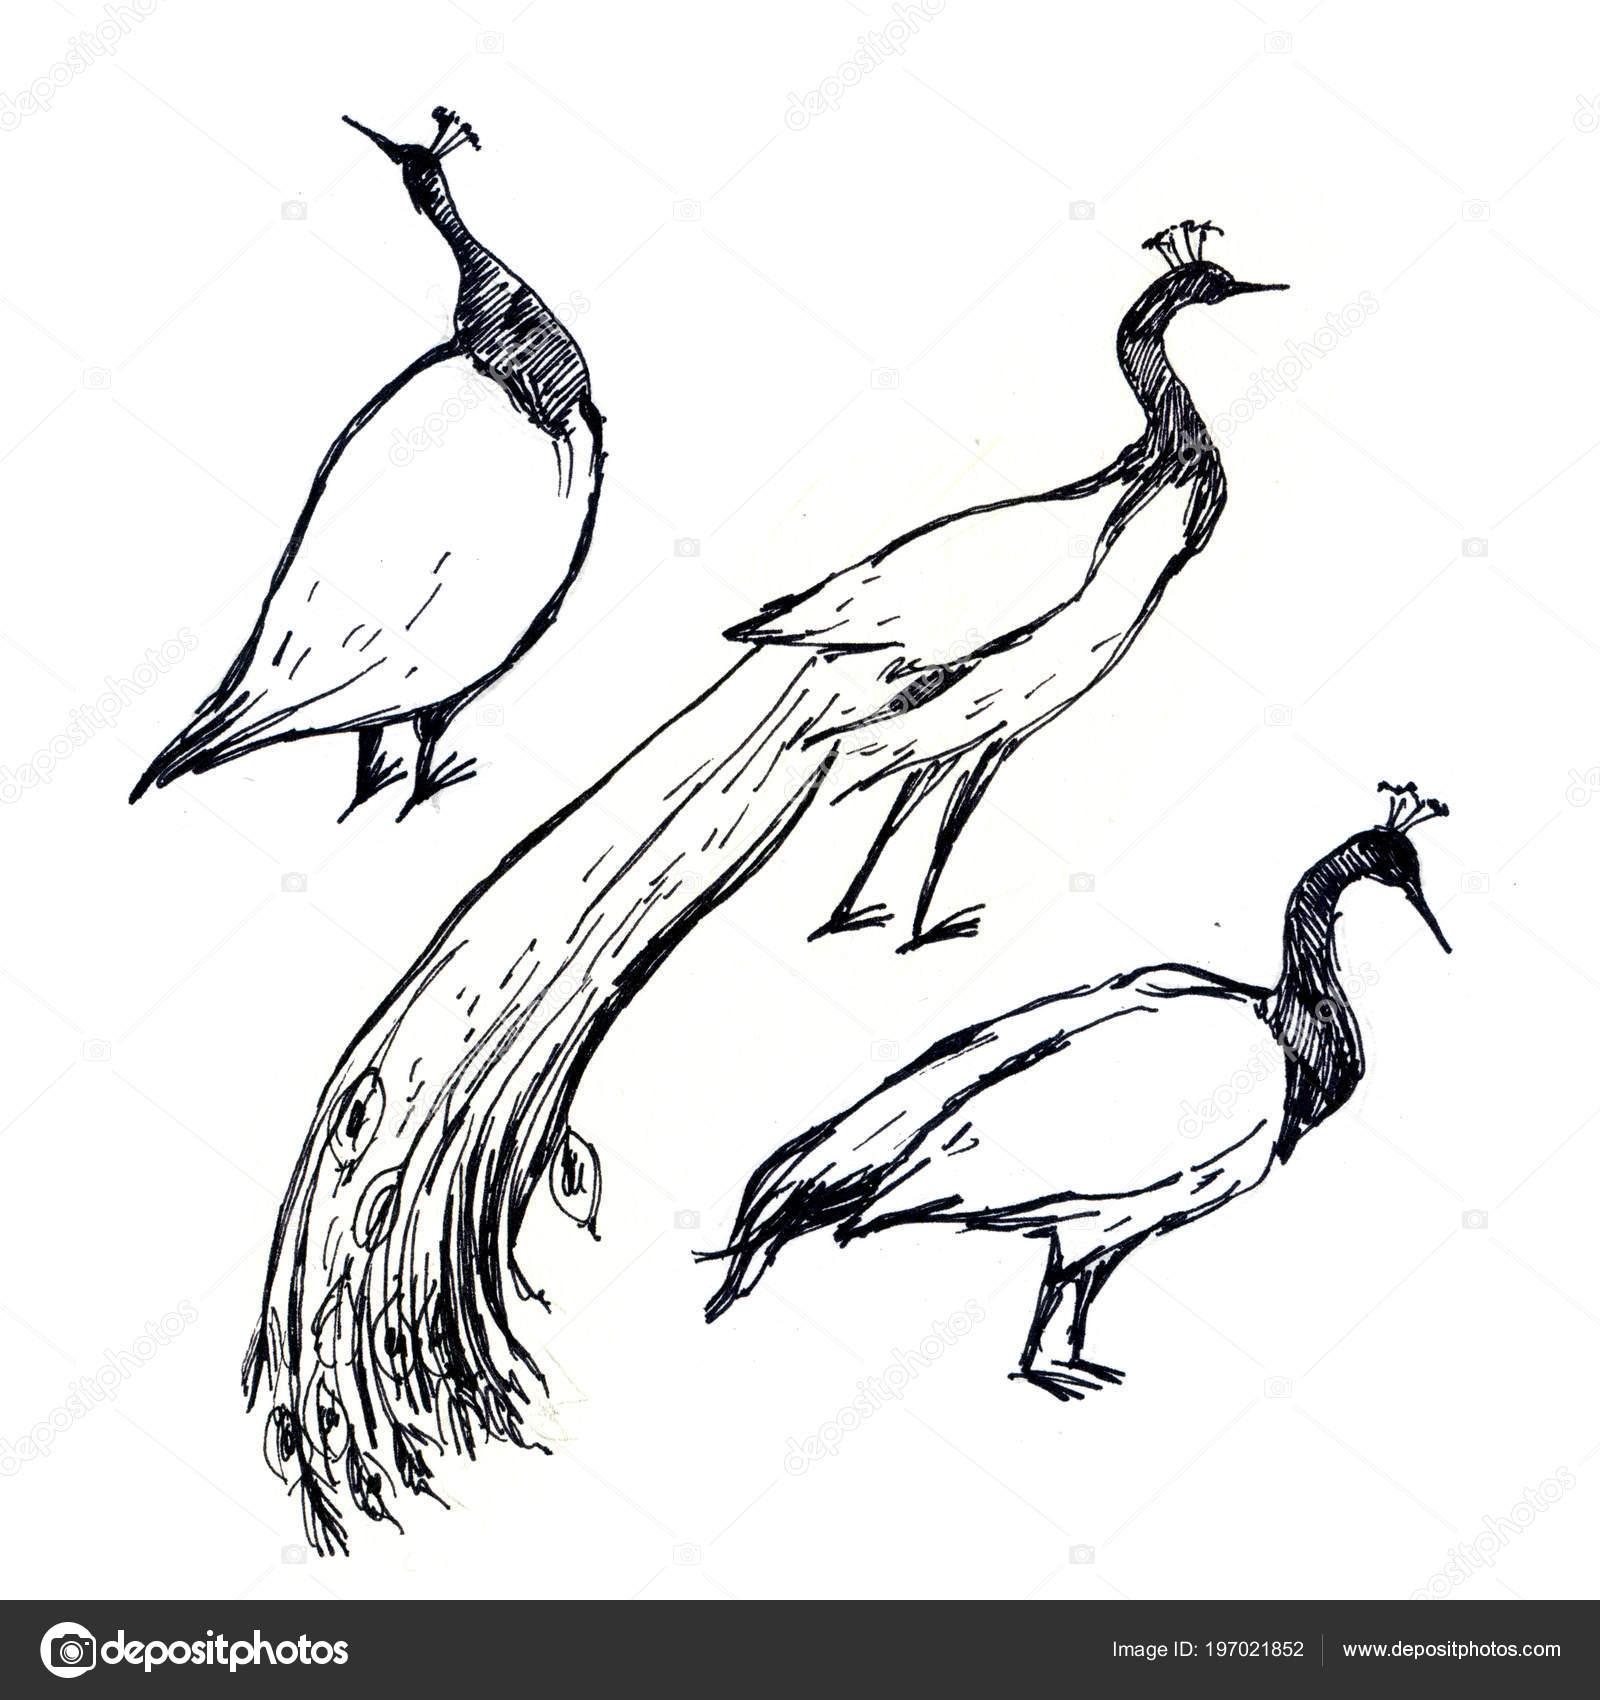 Ilustración Dibujo Pluma Blanco Negro Aves Pavo Real Aislado Sobre ...